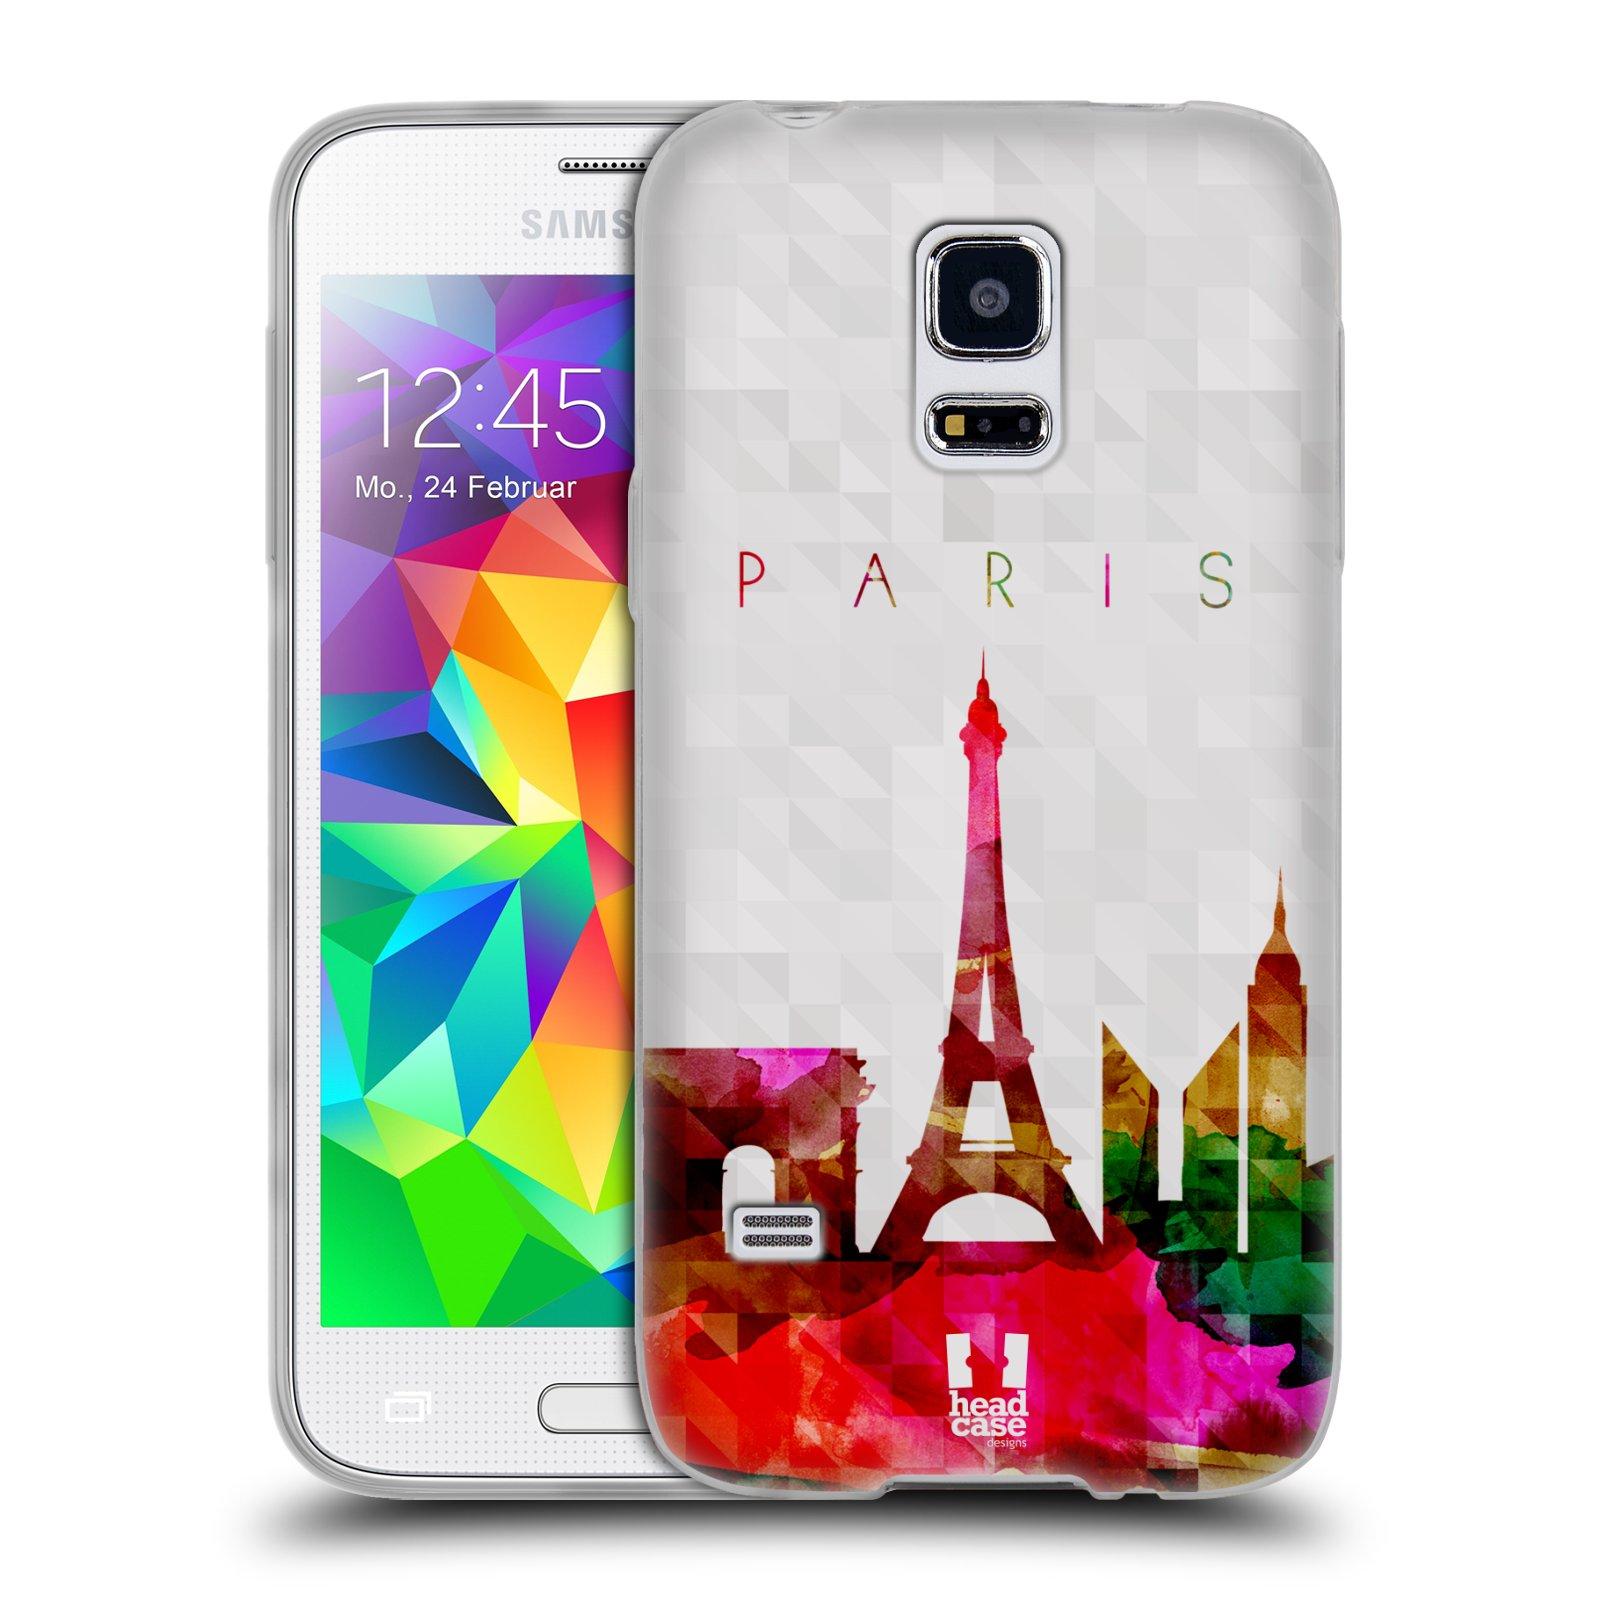 HEAD CASE silikonový obal na mobil Samsung Galaxy S5 MINI vzor Vodní barva města silueta PAŘÍŽ FRANICE EIFFELOVA VĚŽ